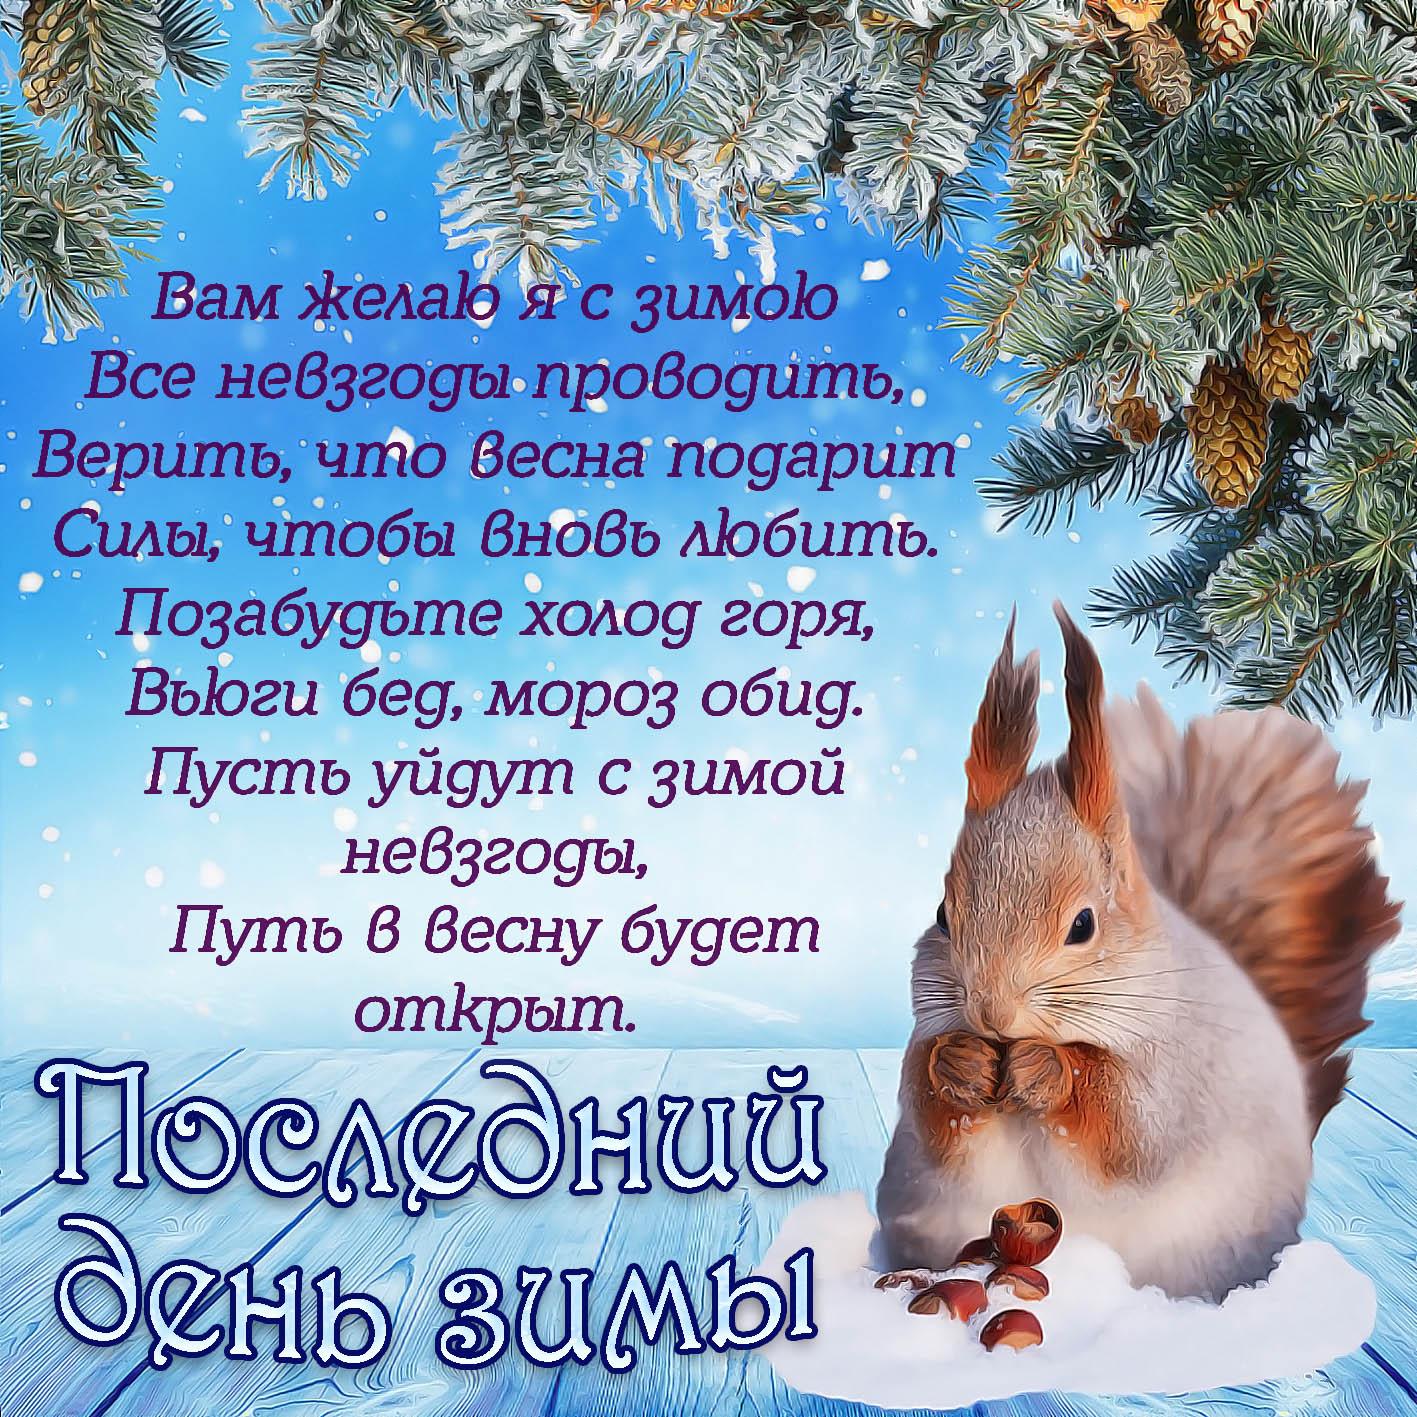 Пожелания на зиму